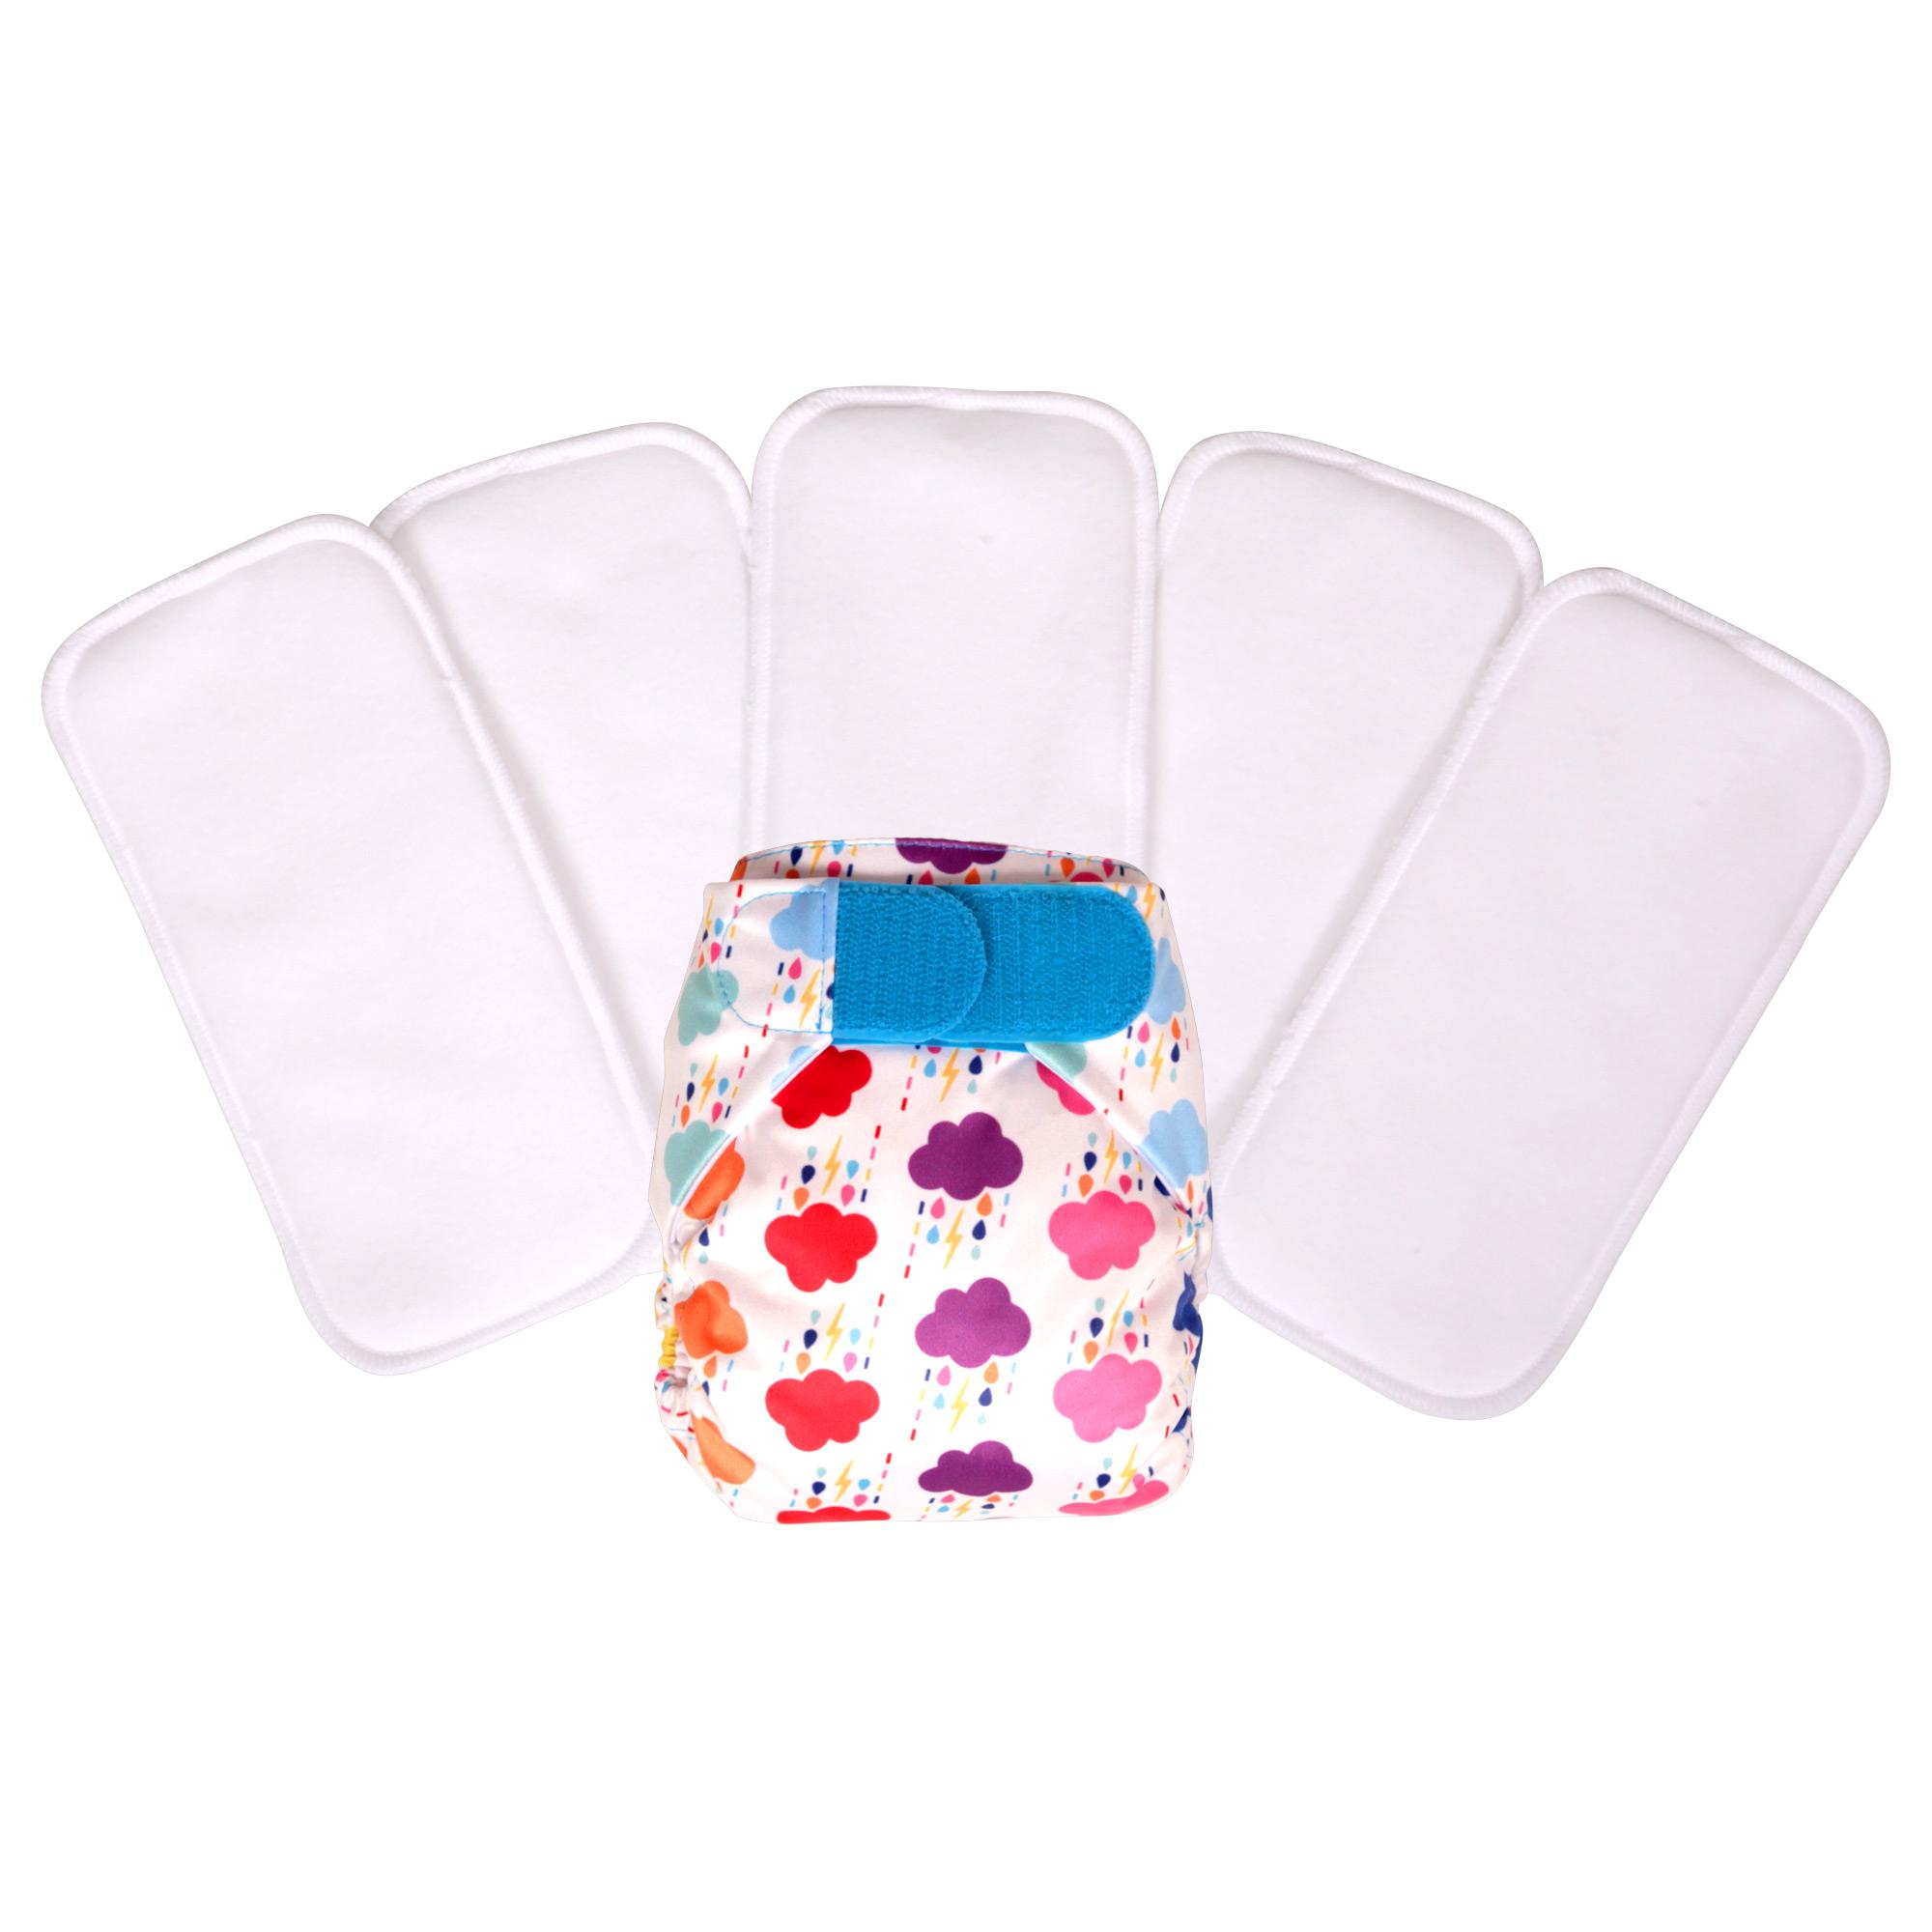 5 pack newborn kit